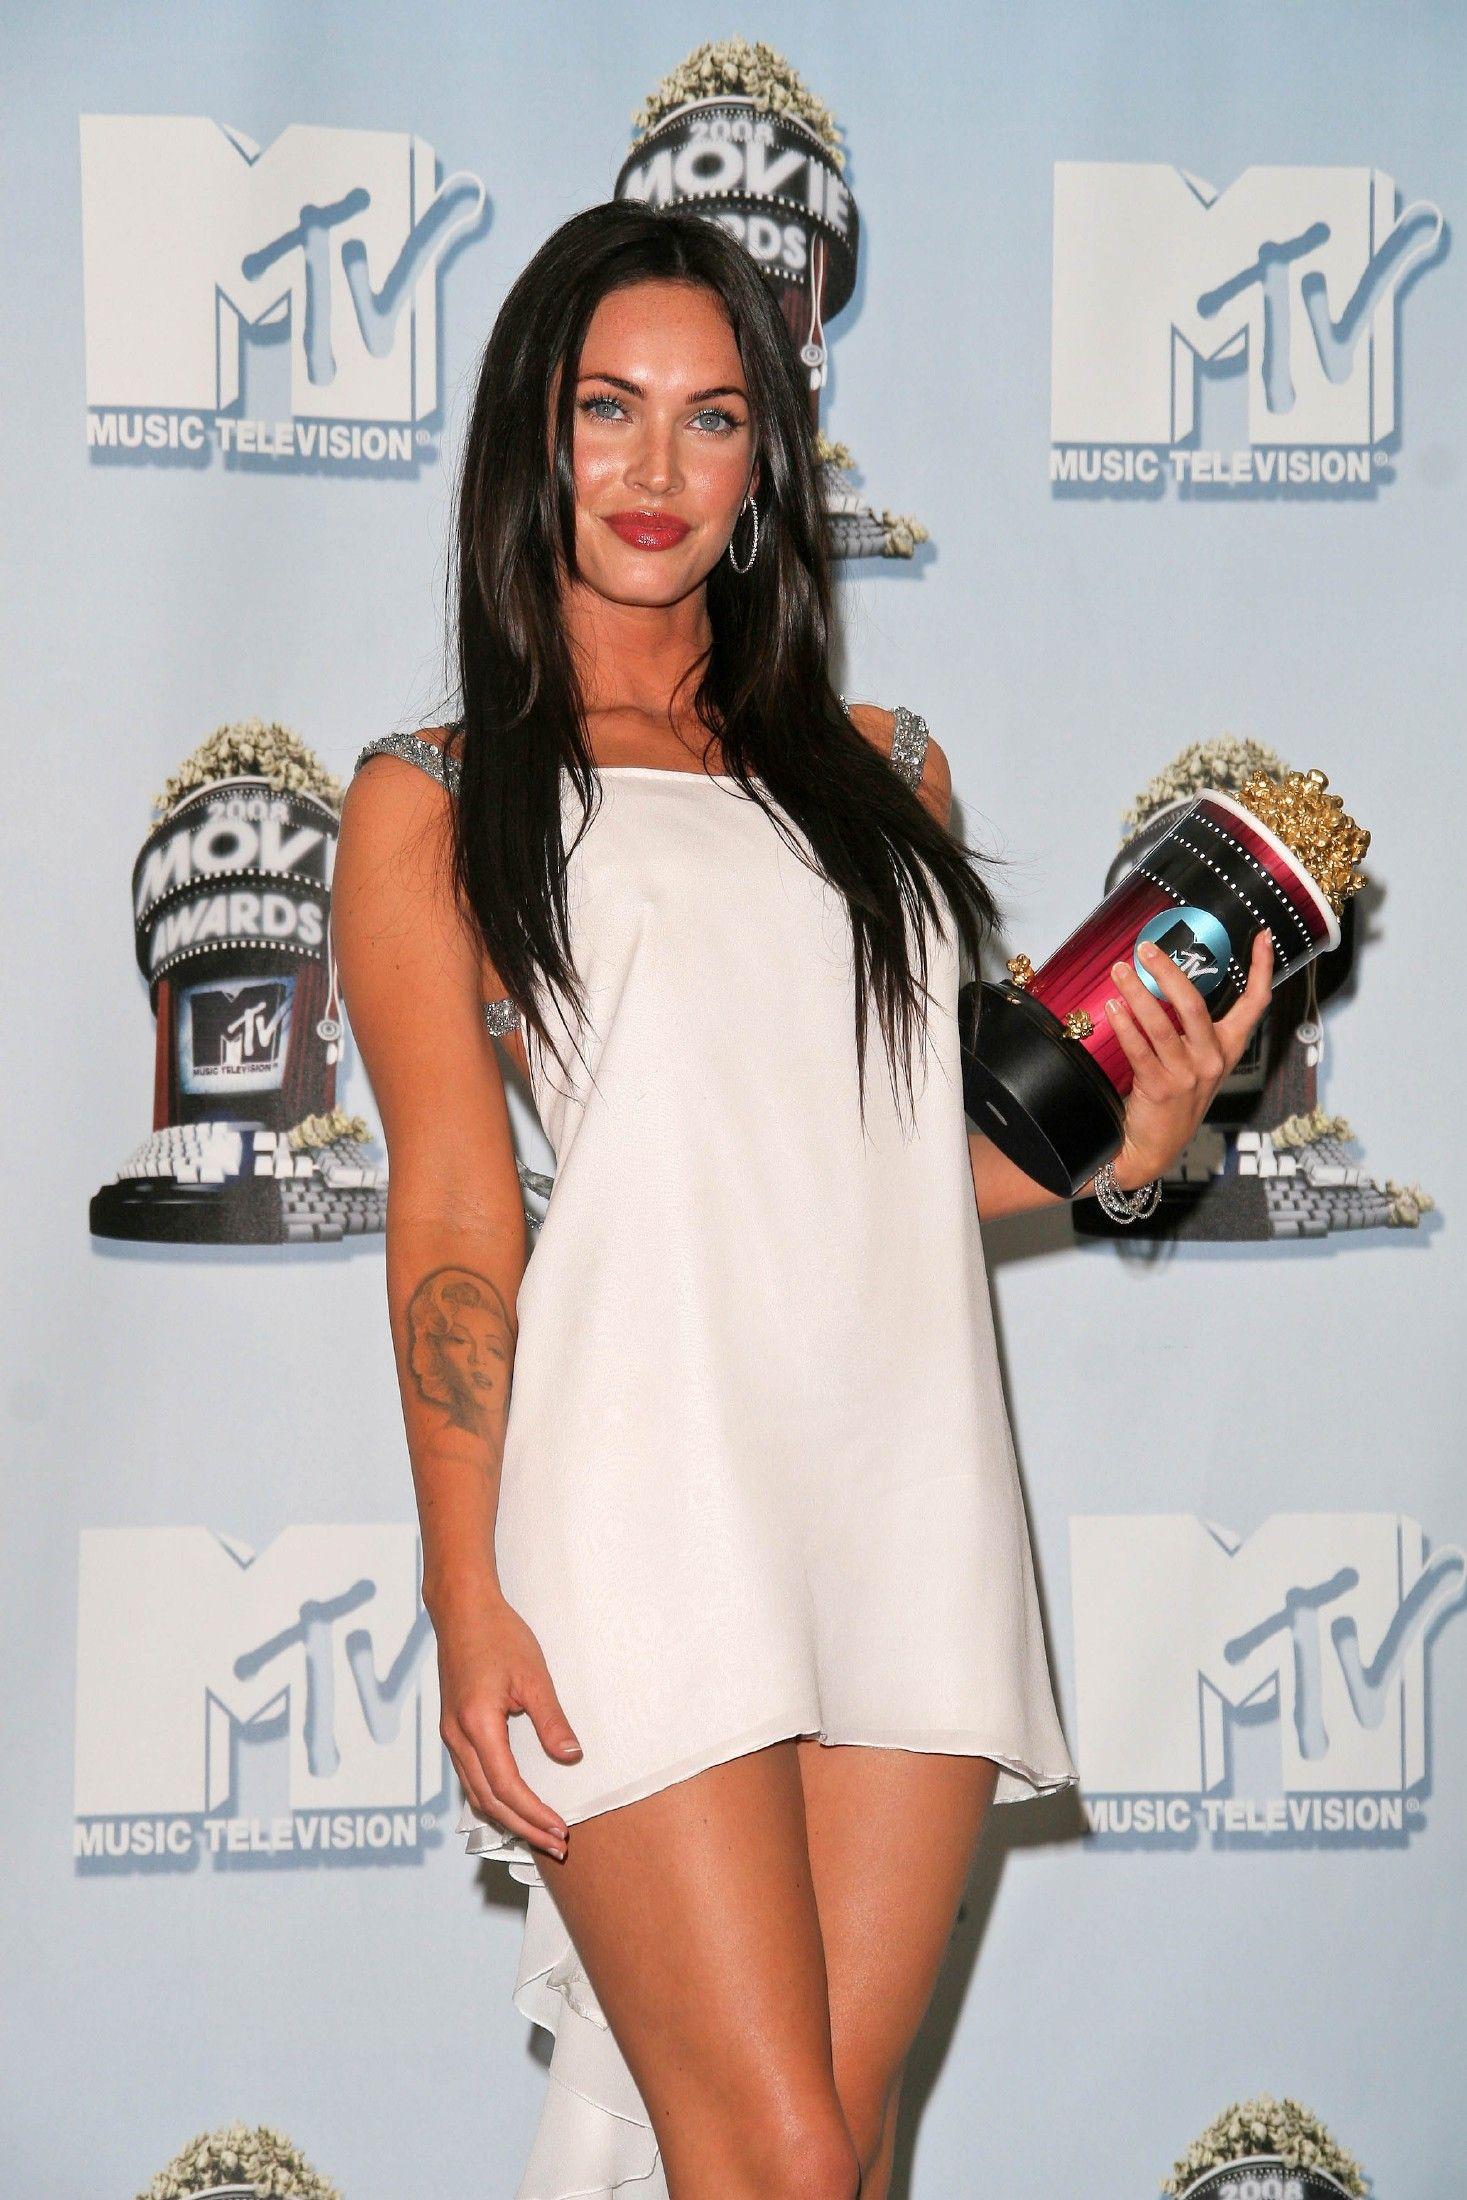 Megan Fox Wearing A Tiny Little White Dress Megan Fox Hot Megan Fox Megan Fox Movies [ 2200 x 1467 Pixel ]